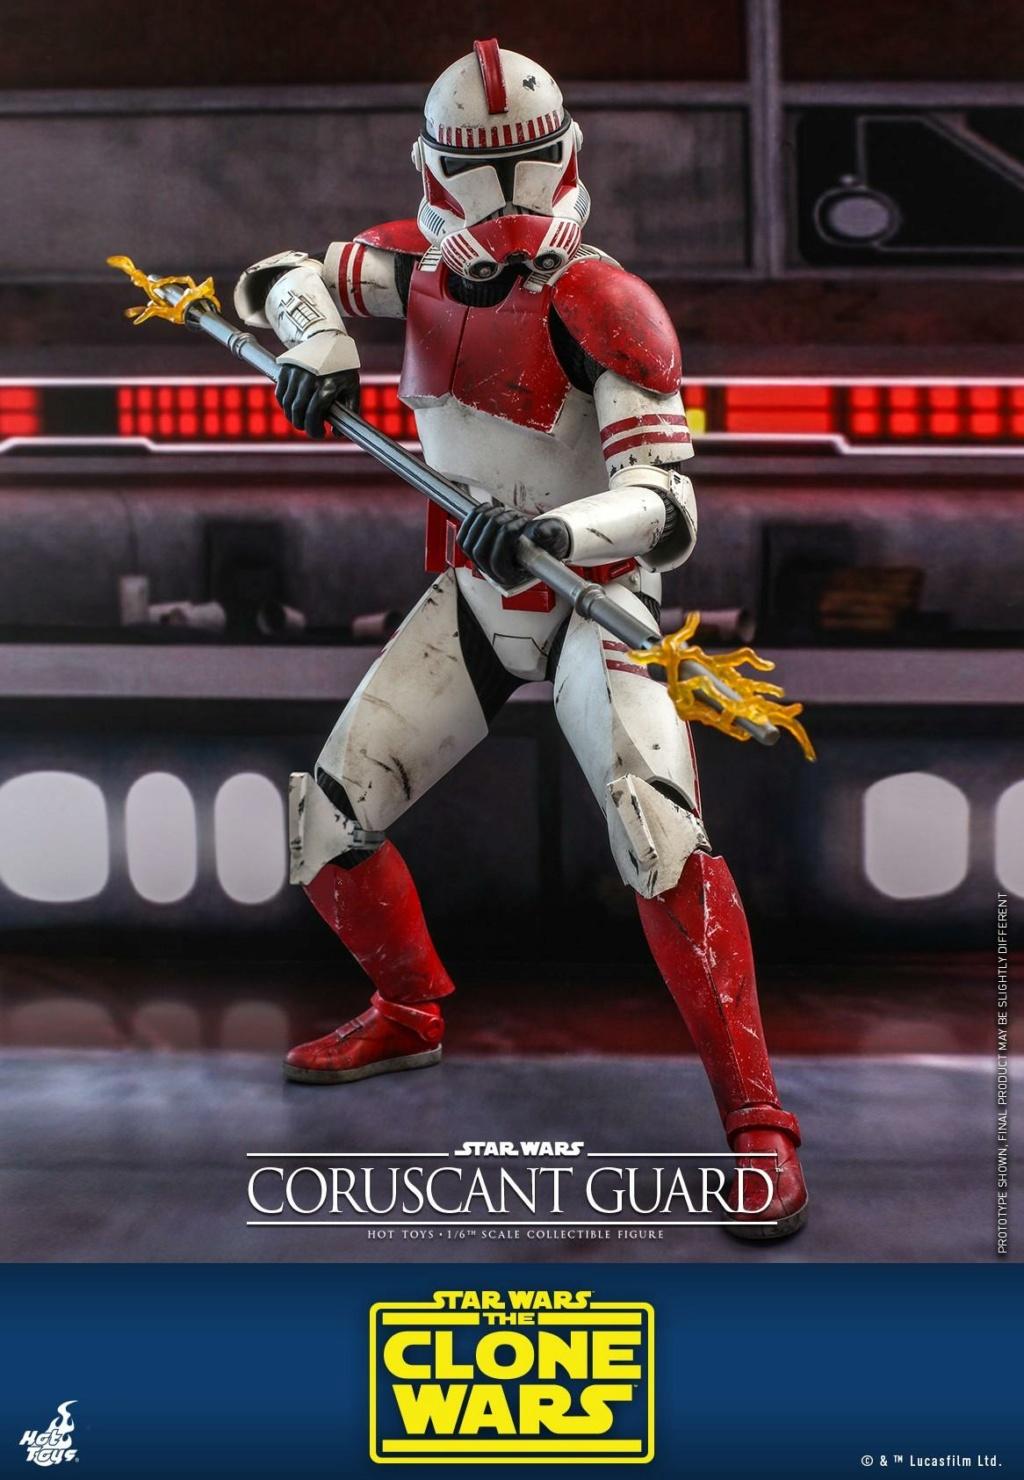 Coruscant Guard - 1/6th Figure - The Clone Wars - Hot Toys Corusc14